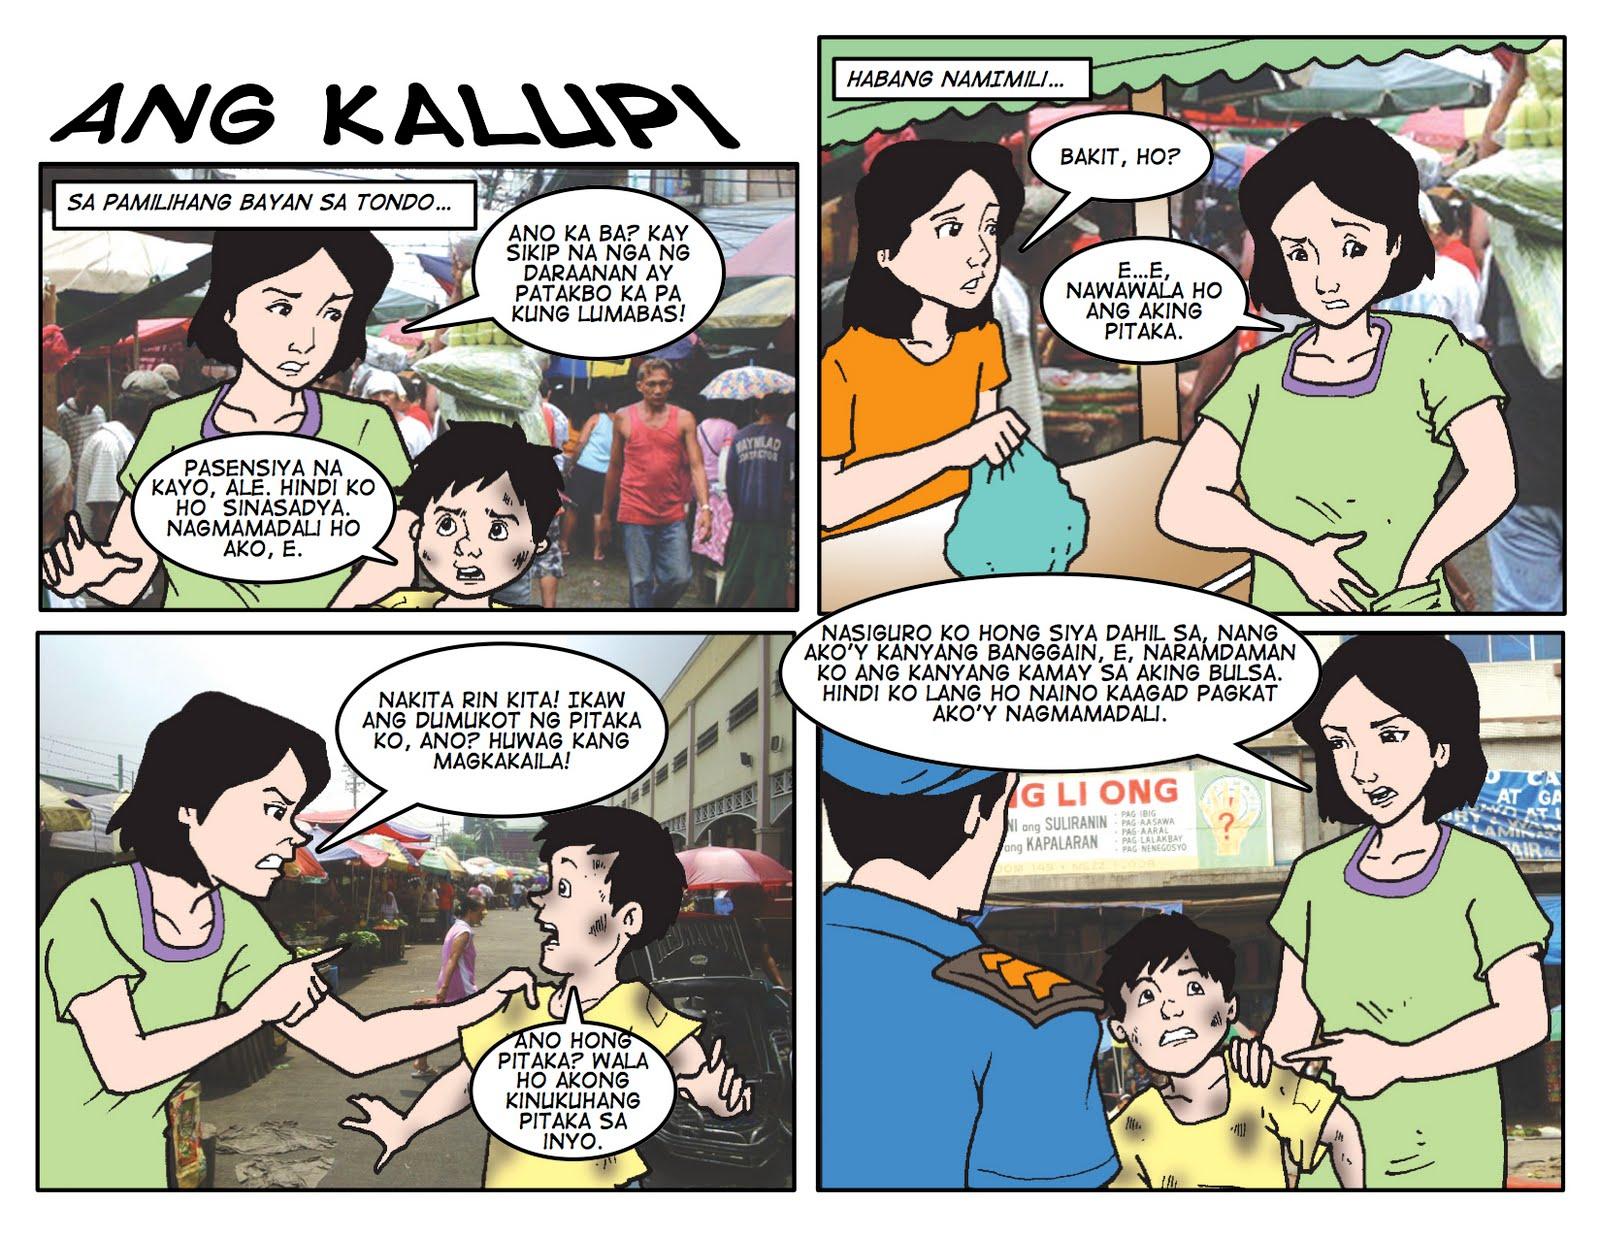 Kayo comic strip #7